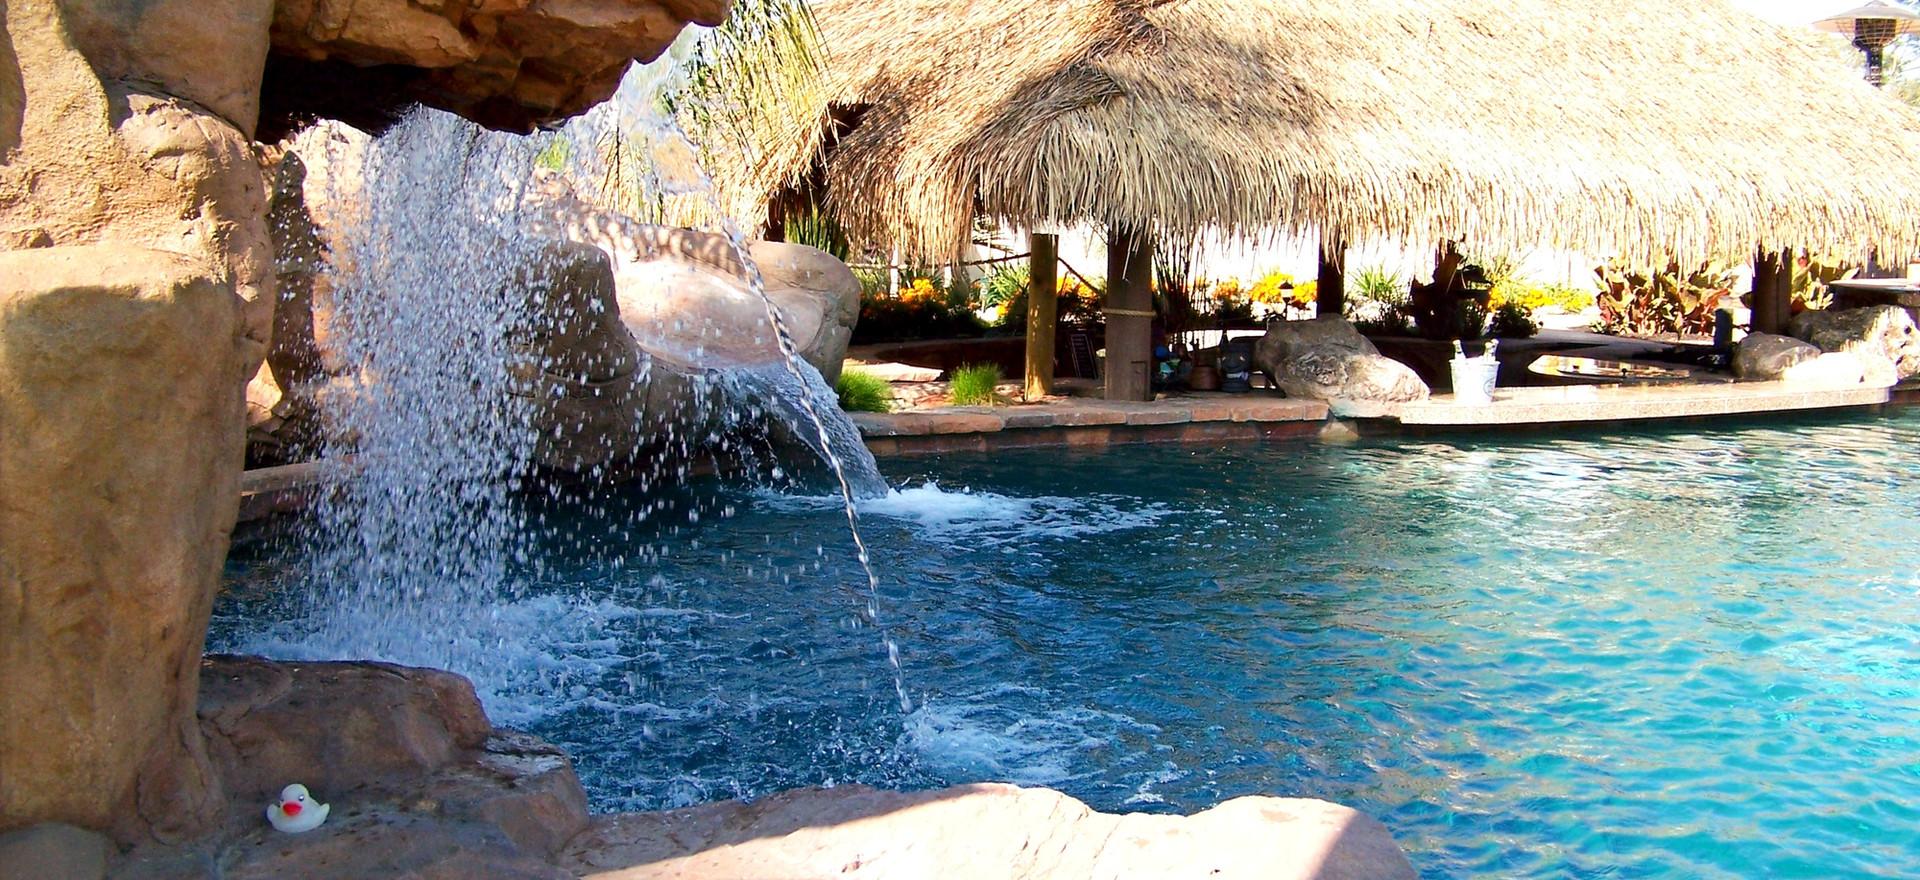 Pool & Spa, Waterfall, Gazebo